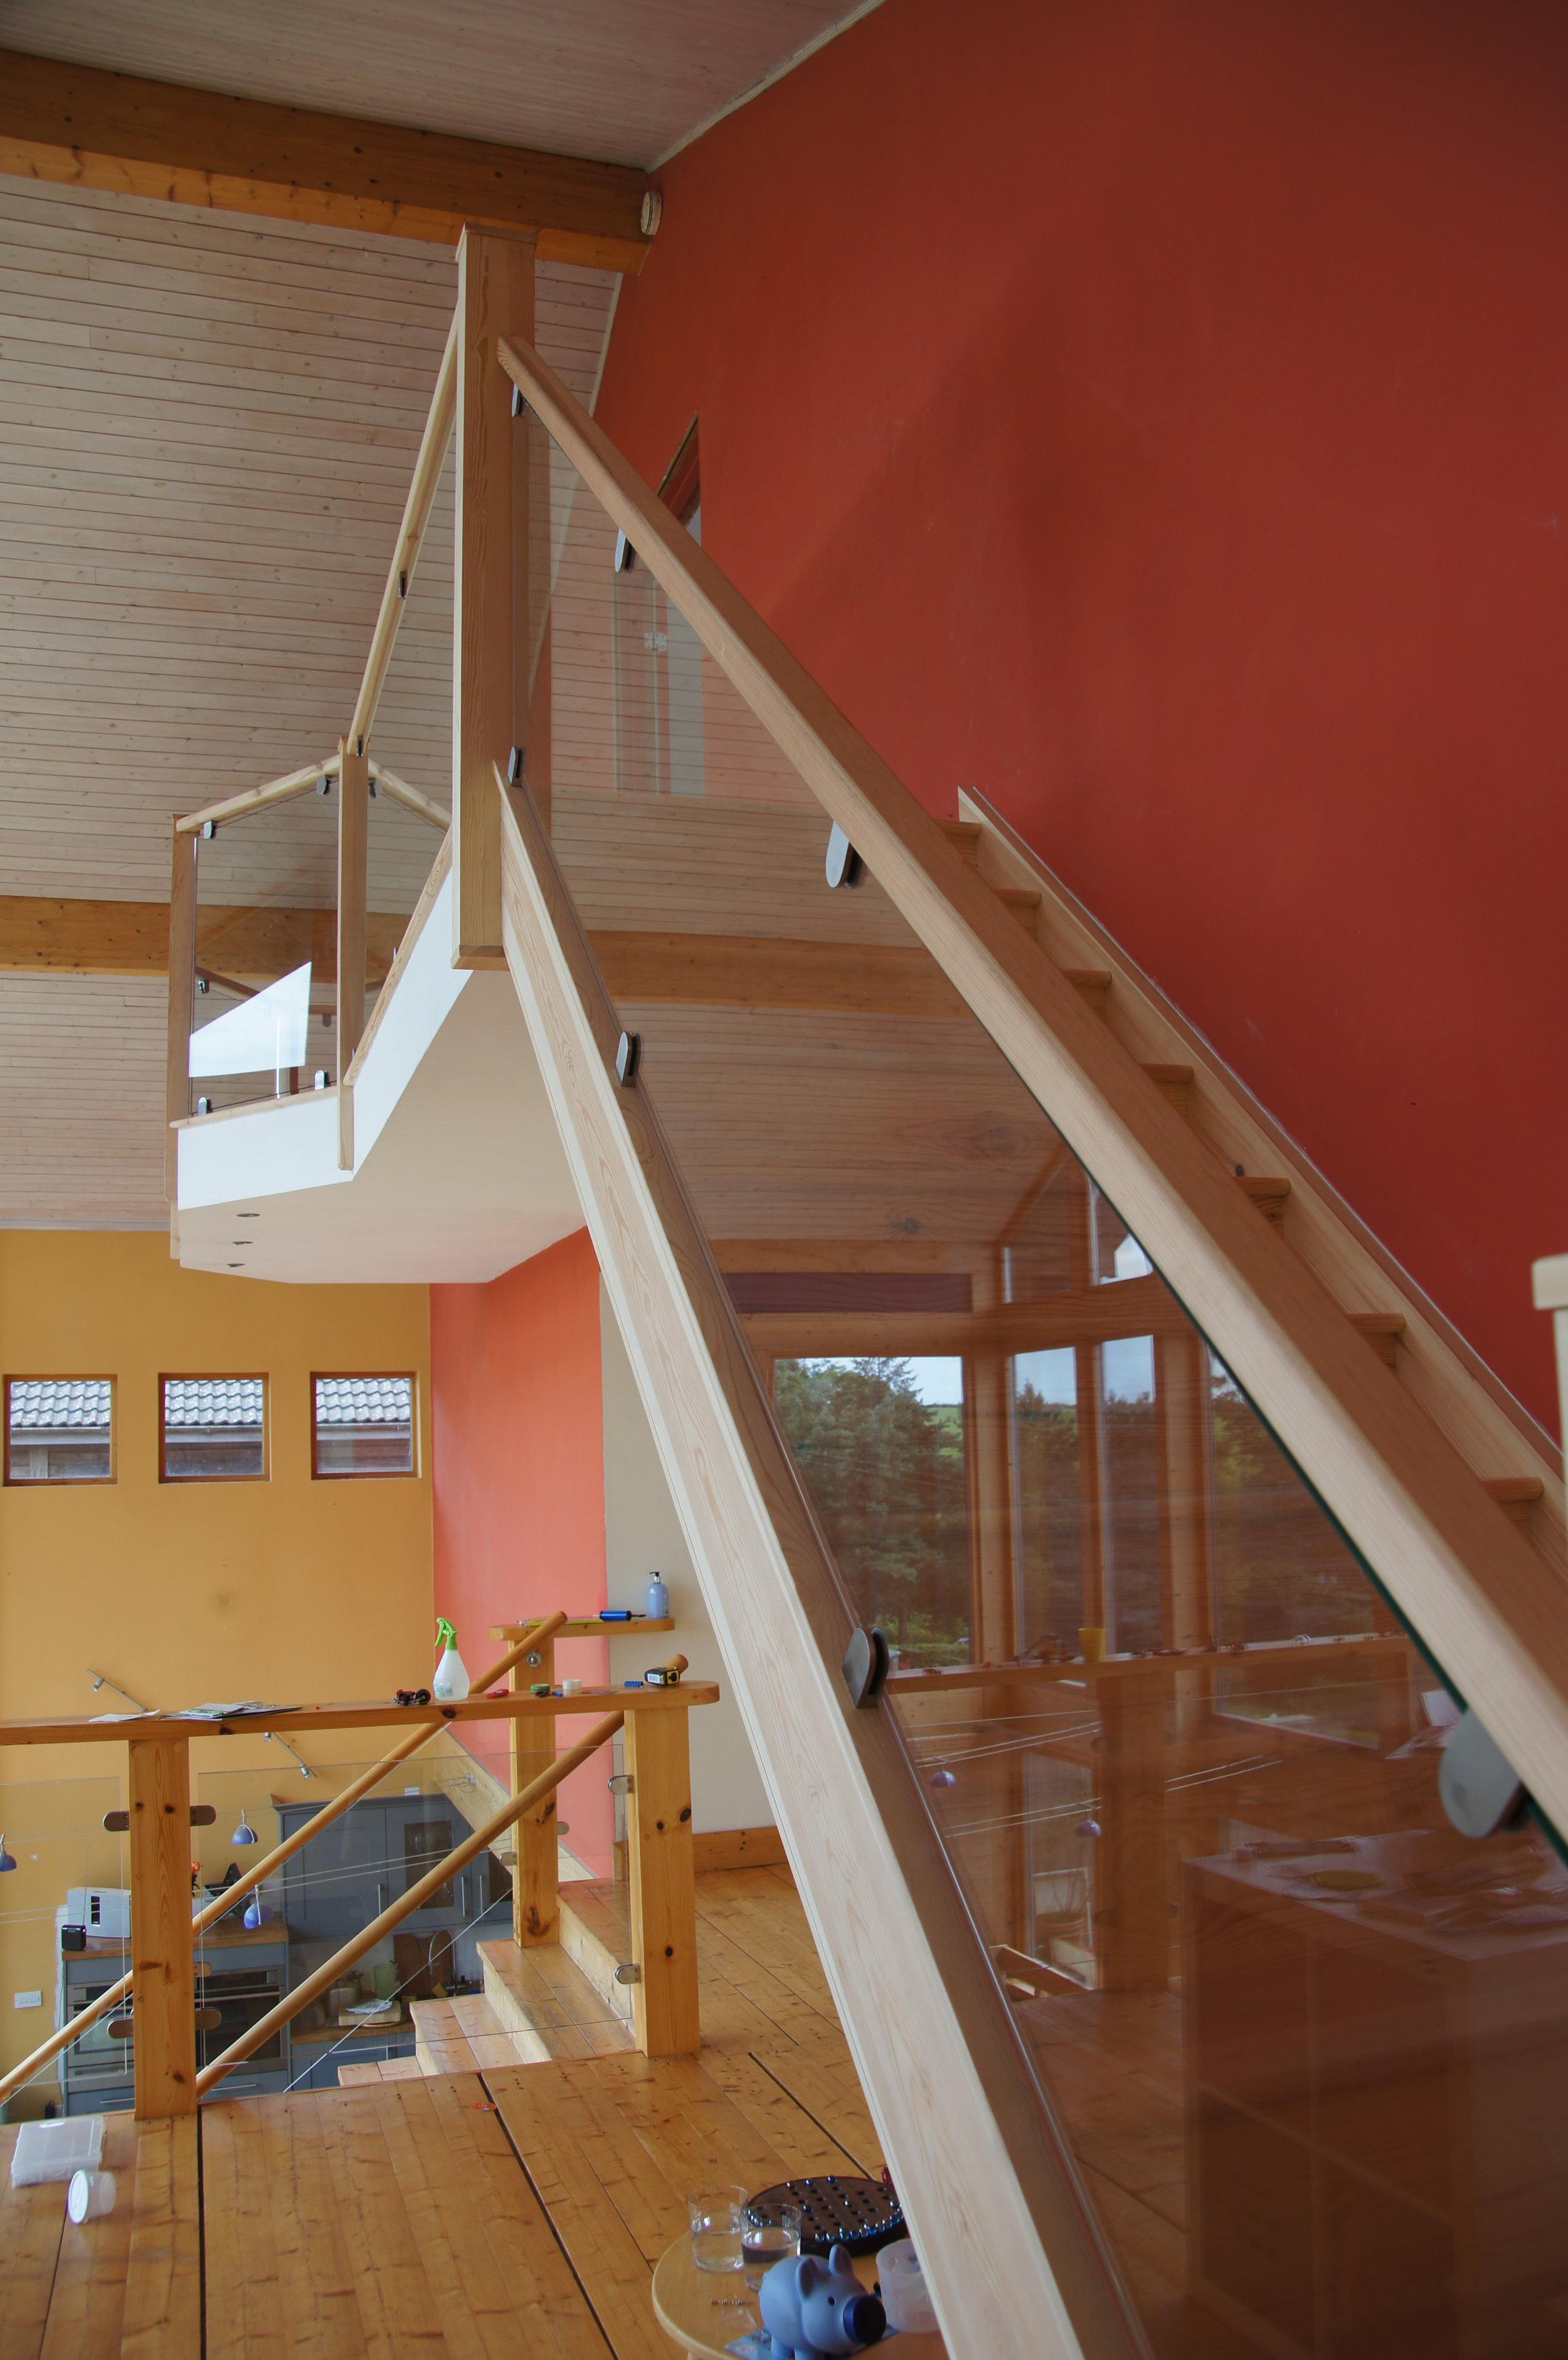 Cowle Staircase 4.JPG